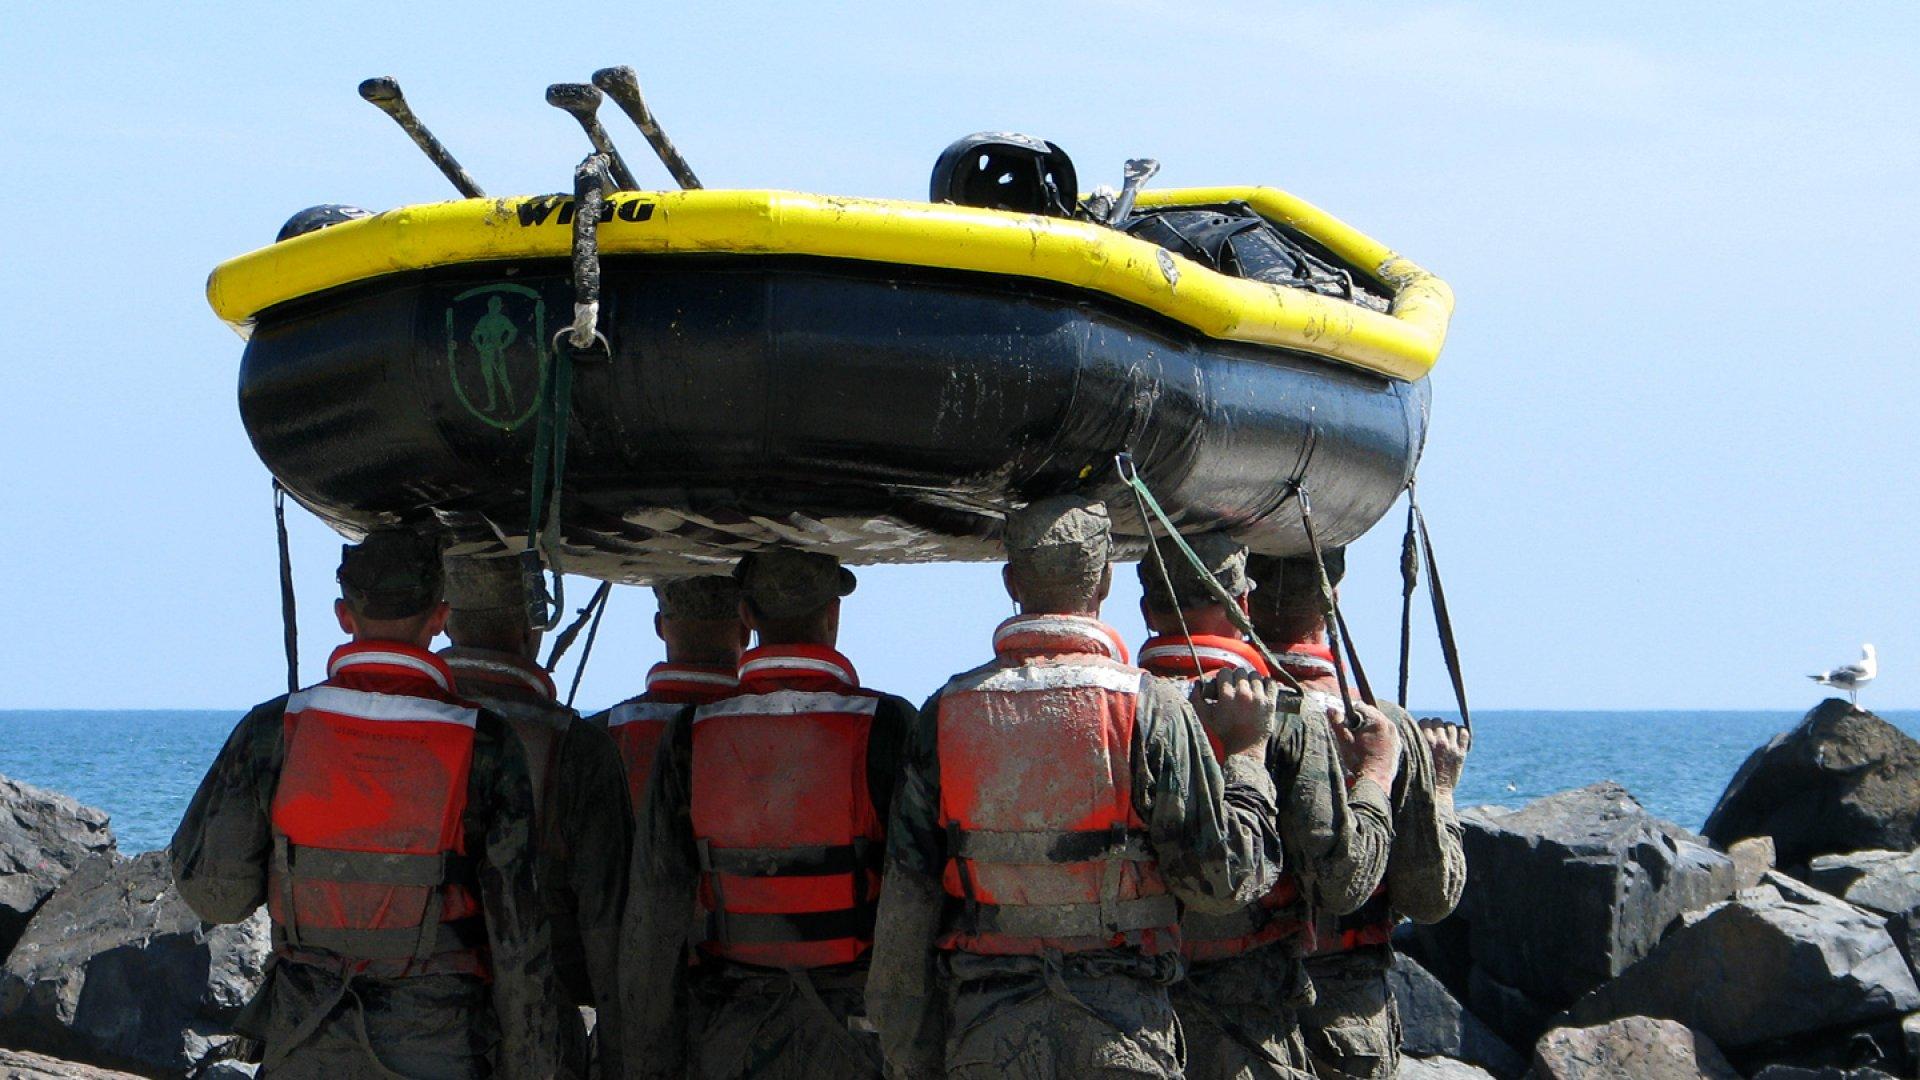 Navy SEAL candidate training. Coronado Island, San Diego.